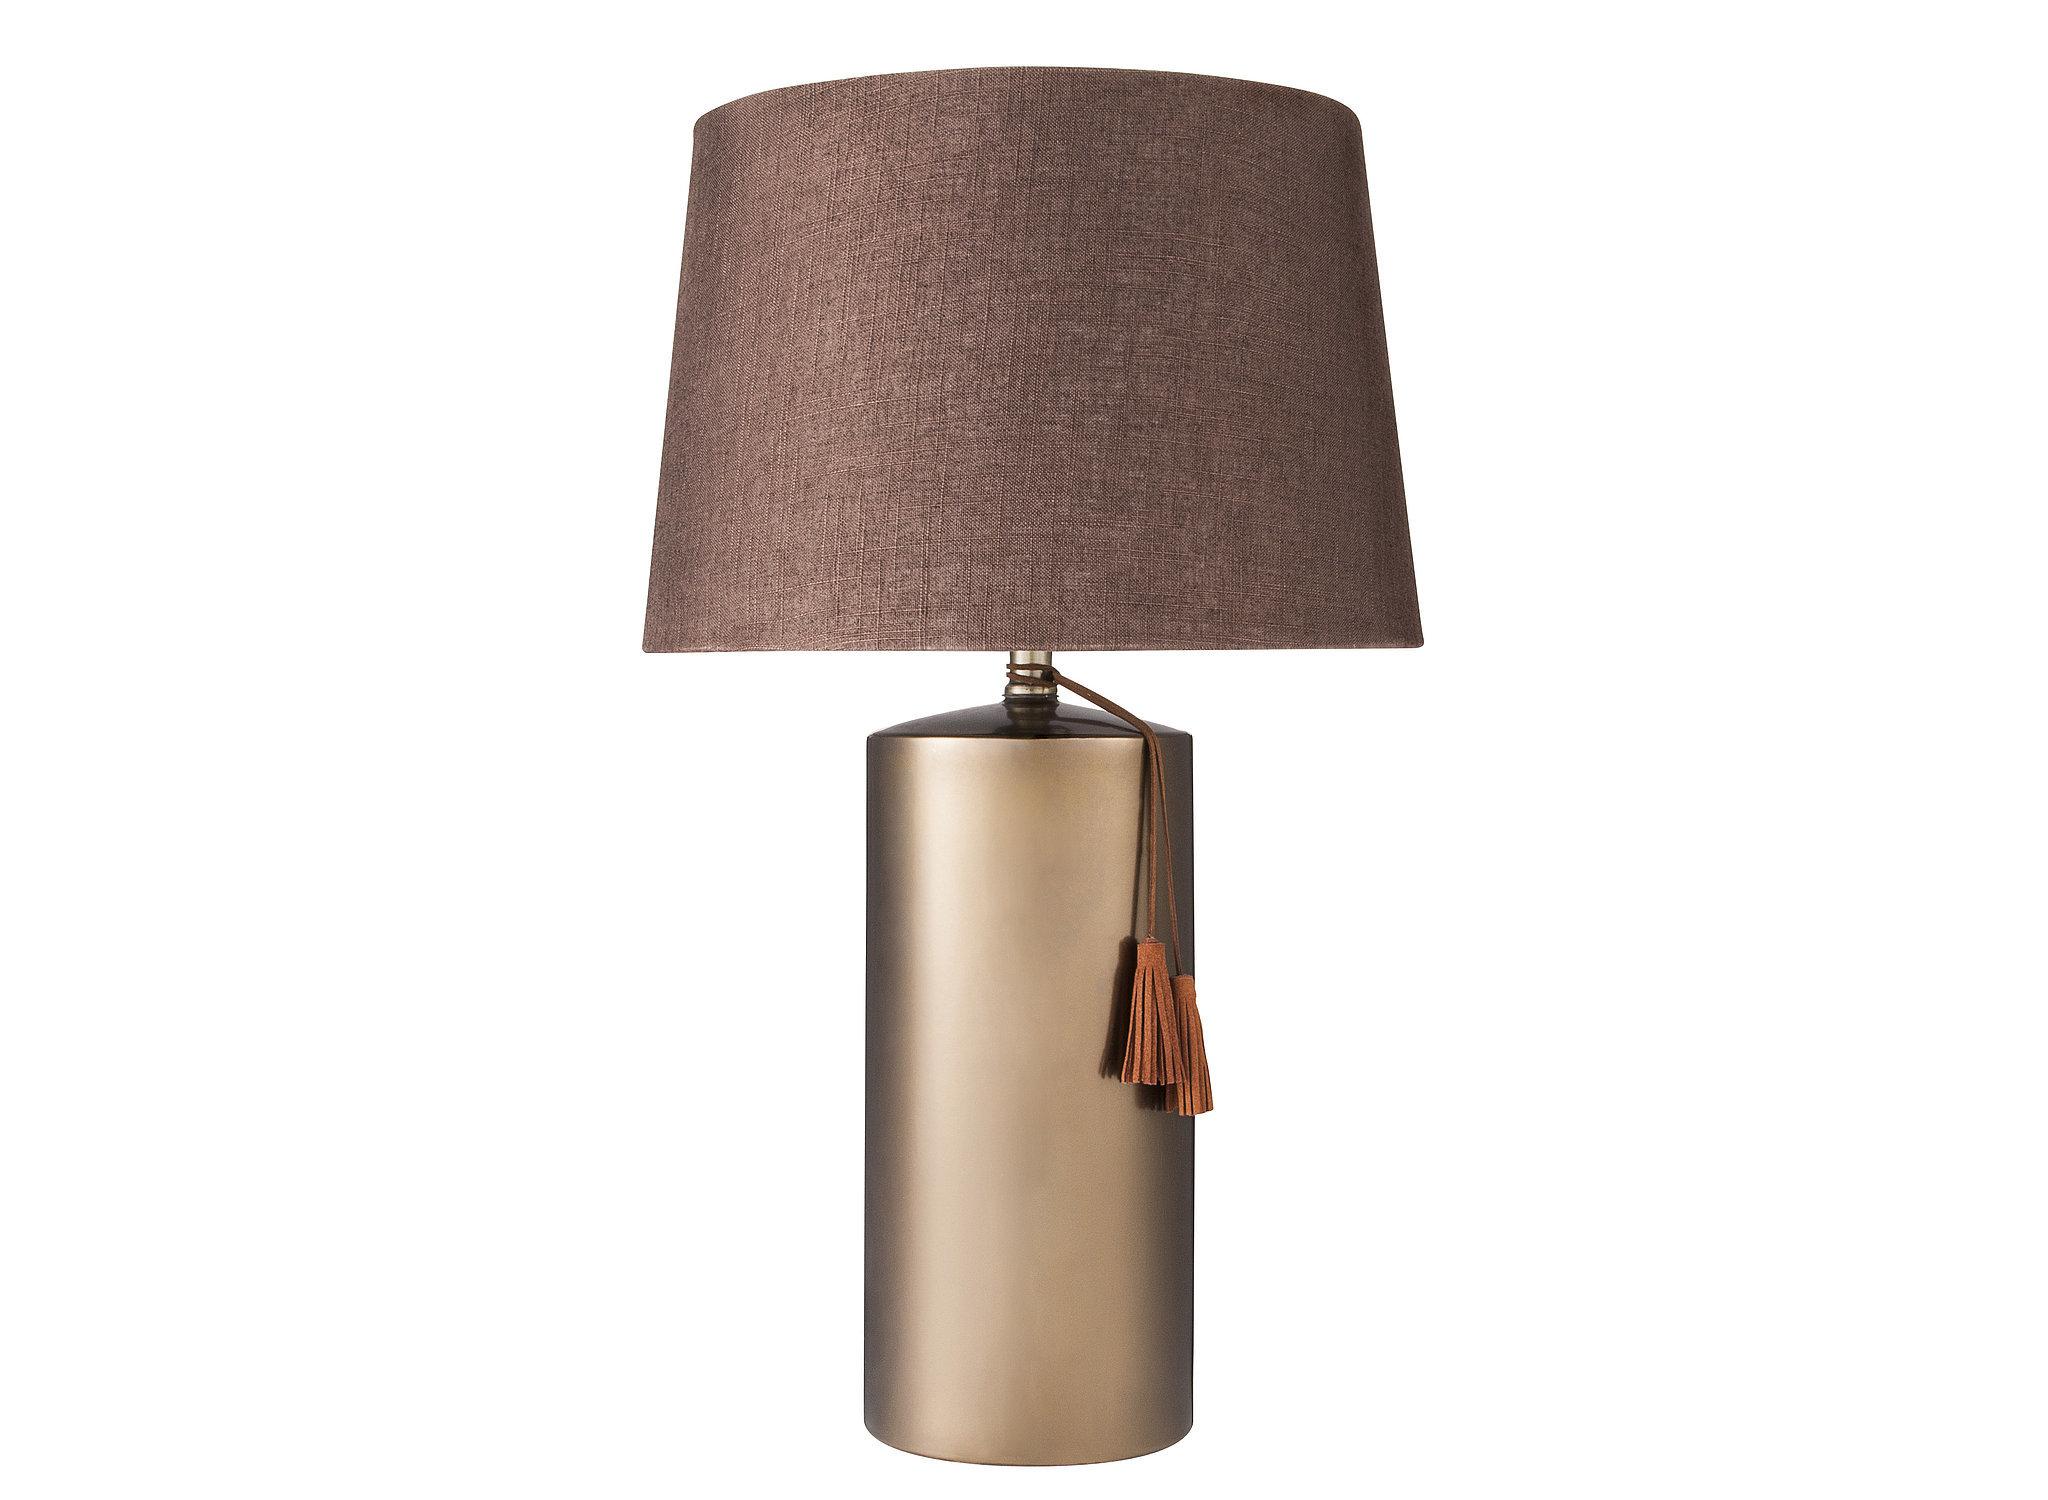 Tassel Lamp ($50) and Linen Lamp Shade ($25)